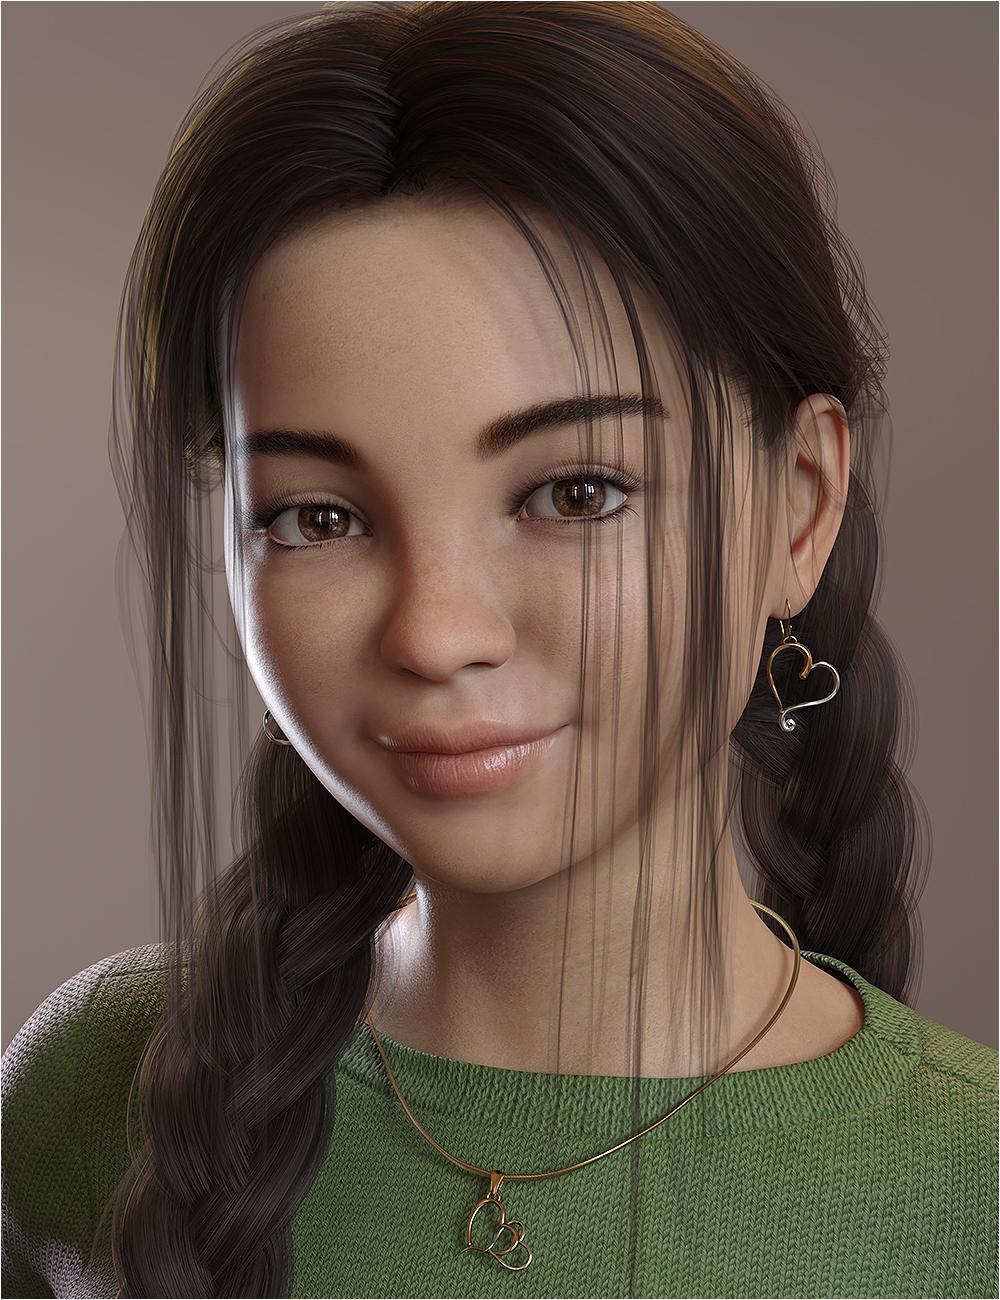 Chrystal Ann for Genesis 8 and Genesis 8.1 Female by: OziChickhotlilme74, 3D Models by Daz 3D